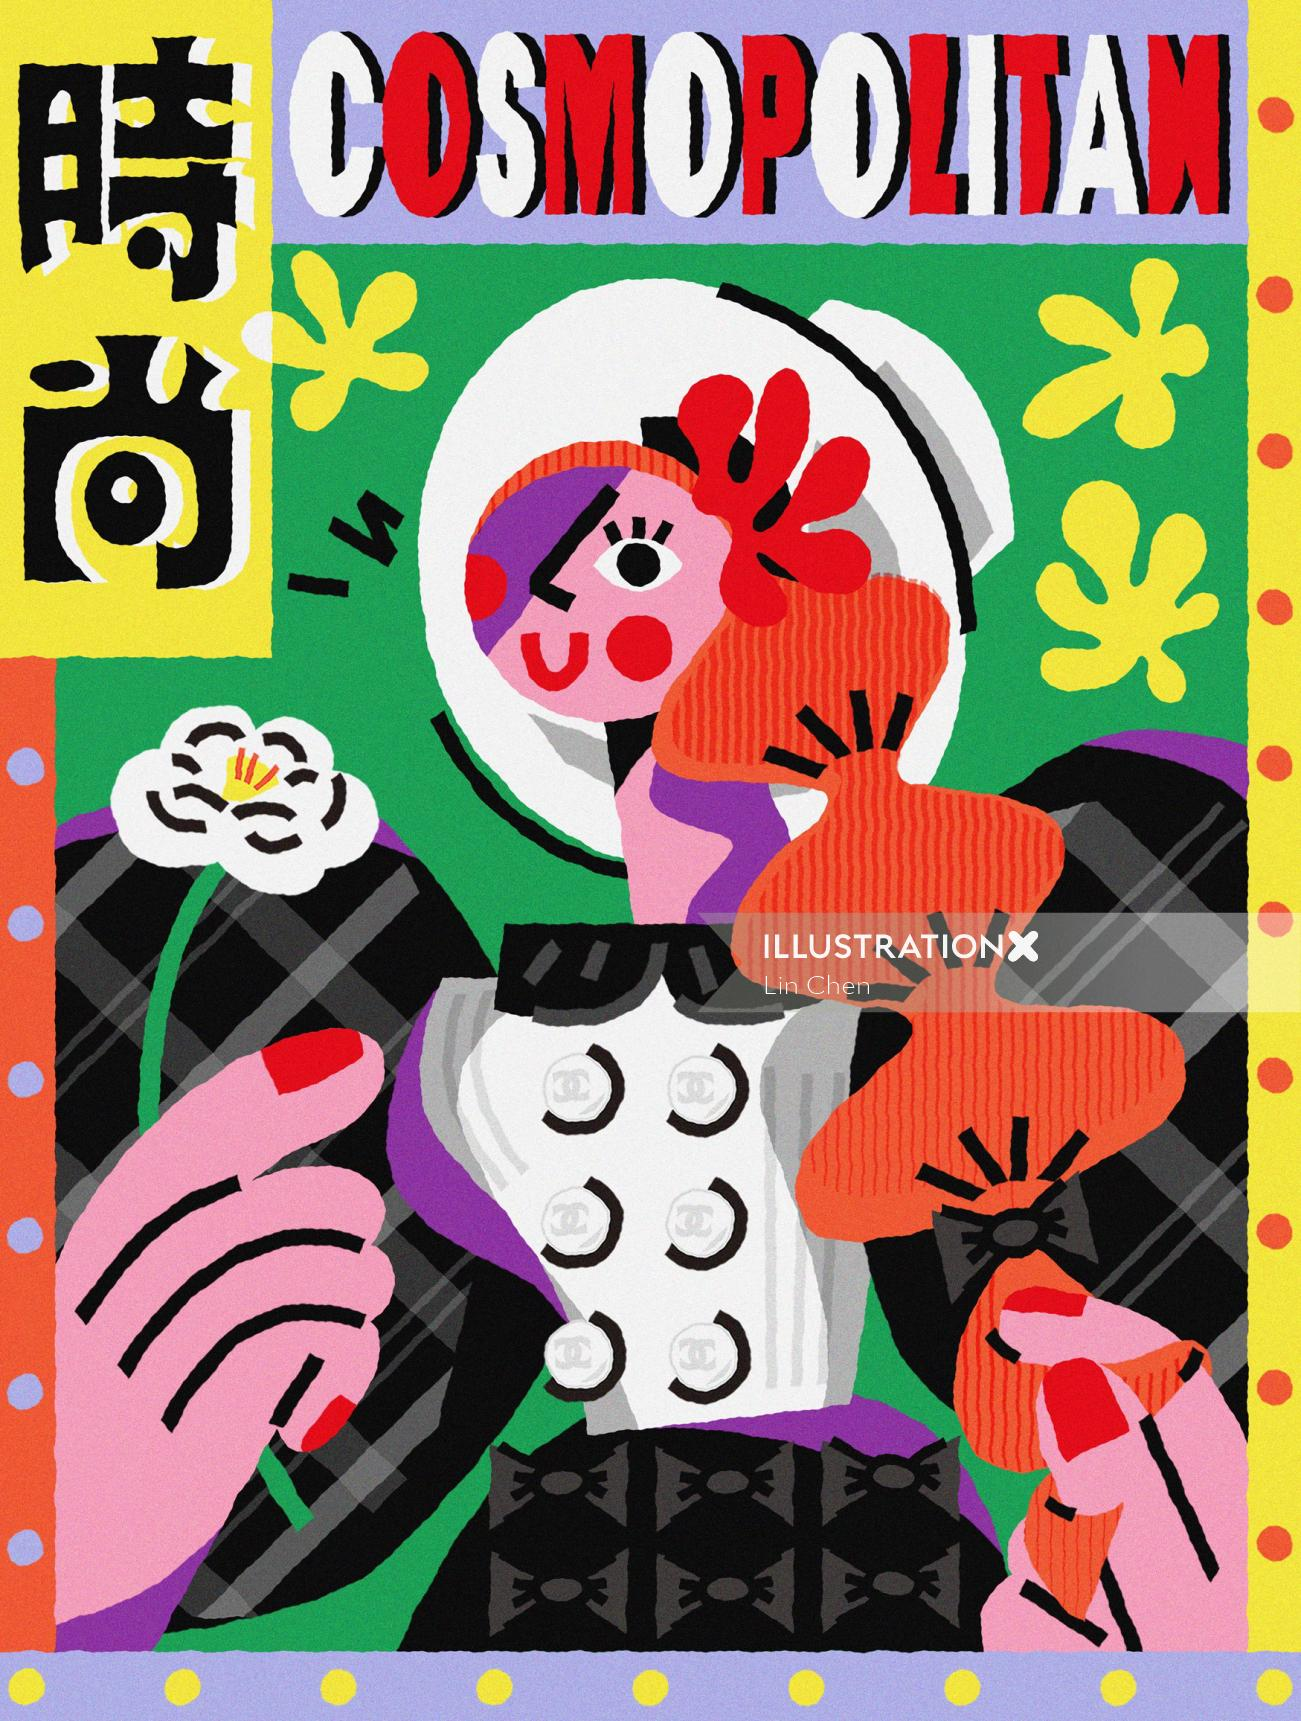 Graphic Cosmoplitan cover